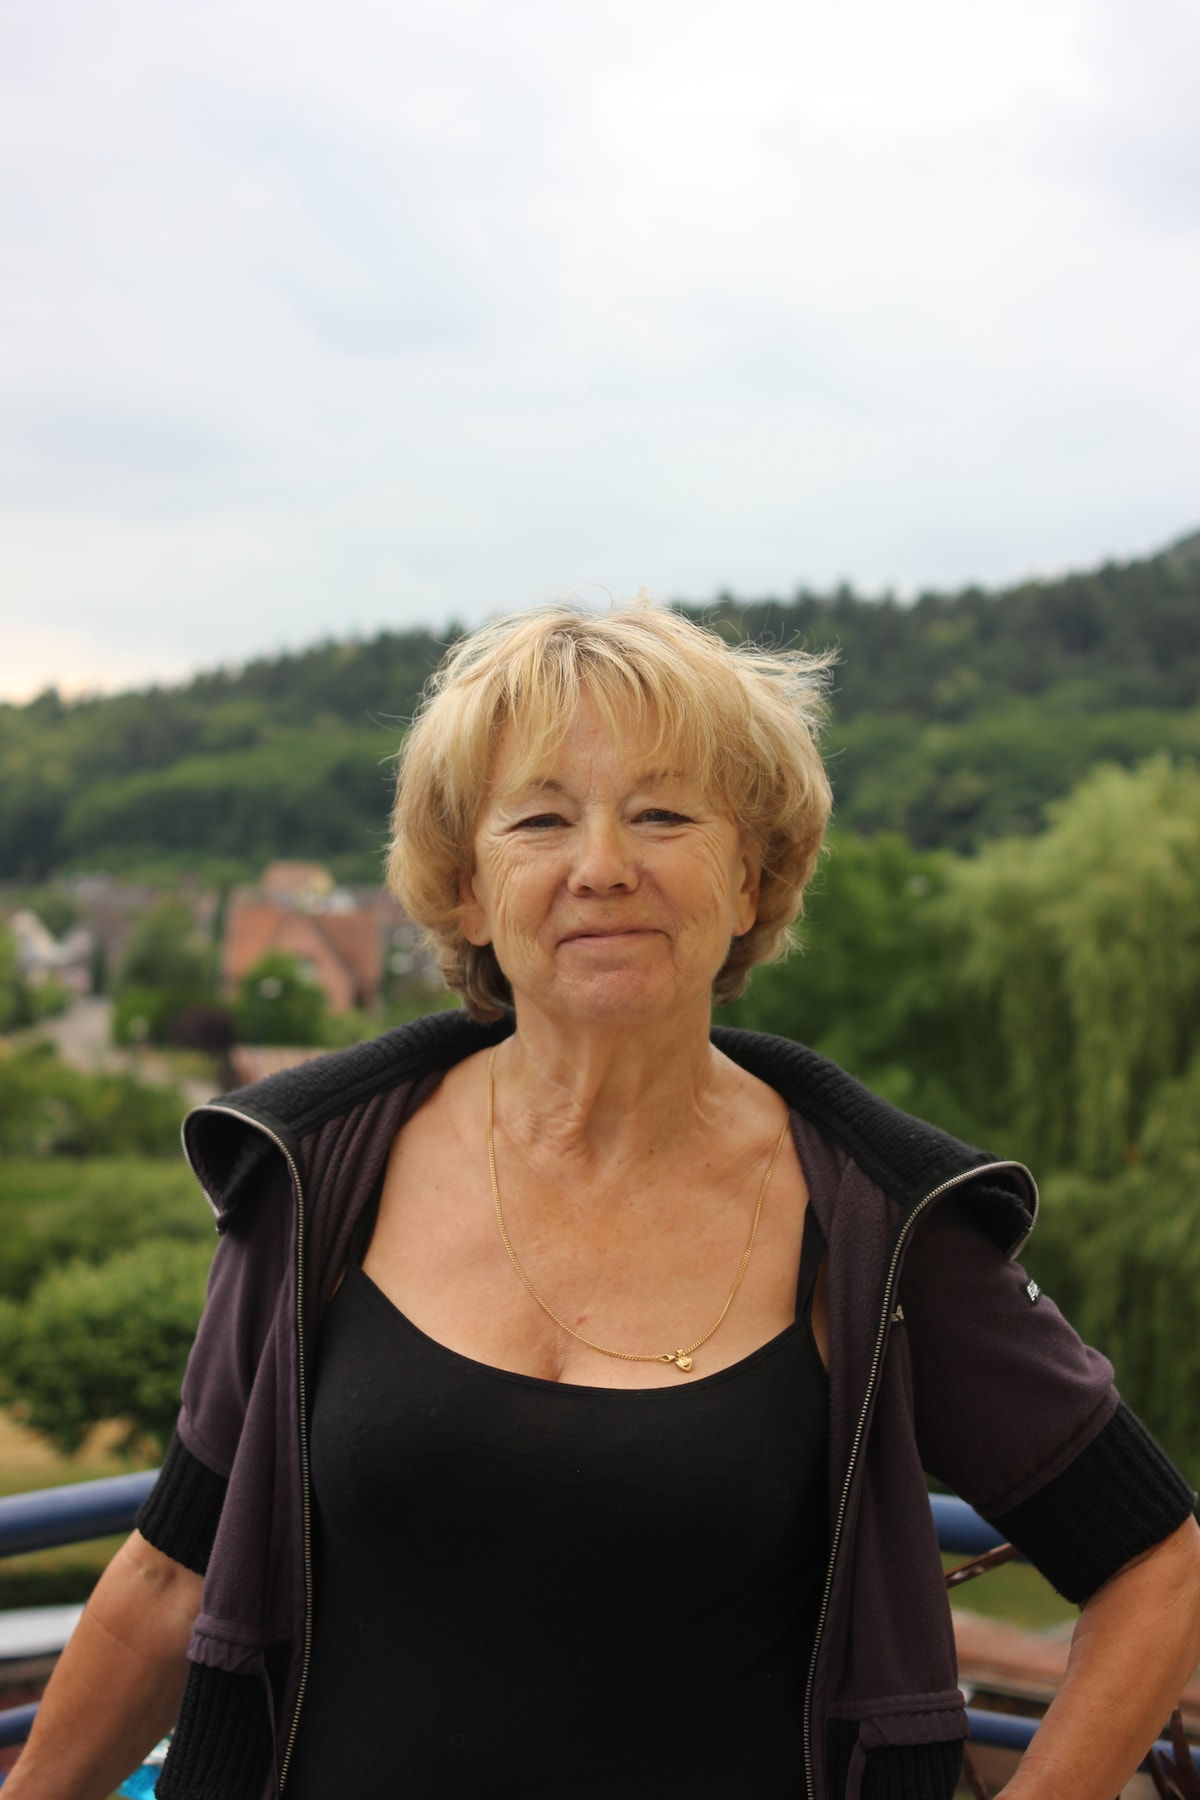 Liliane from Dossenheim-sur-Zinsel